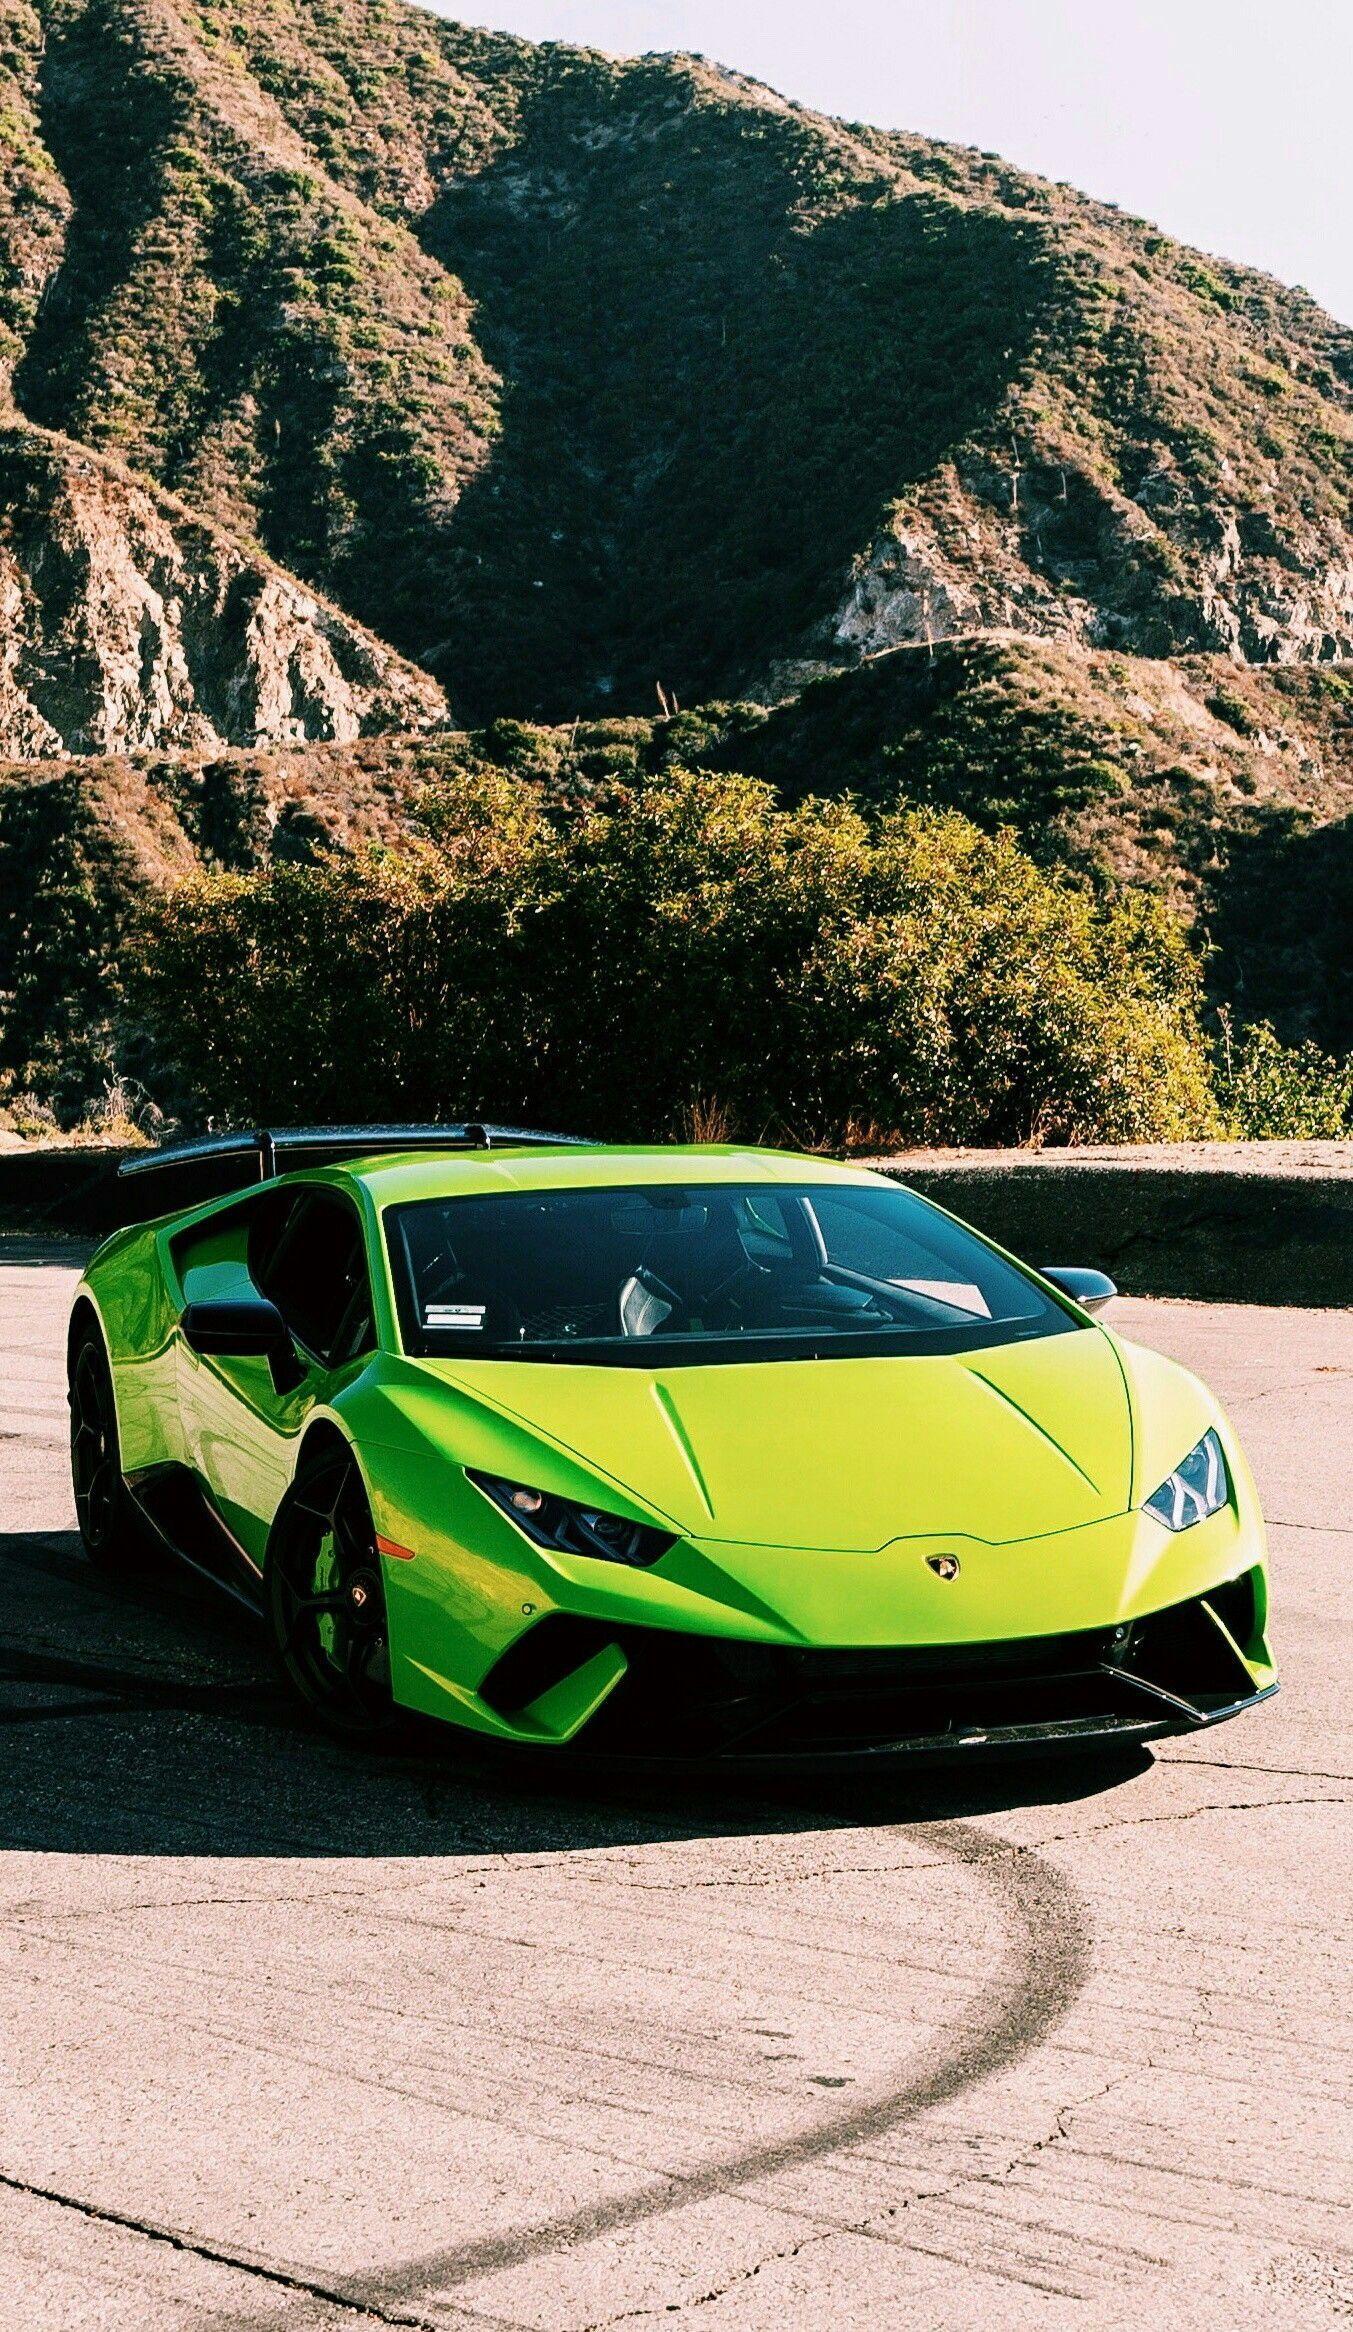 Green Lamborghini Iphone Wallpapers Top Free Green Lamborghini Iphone Backgrounds Wallpaperaccess